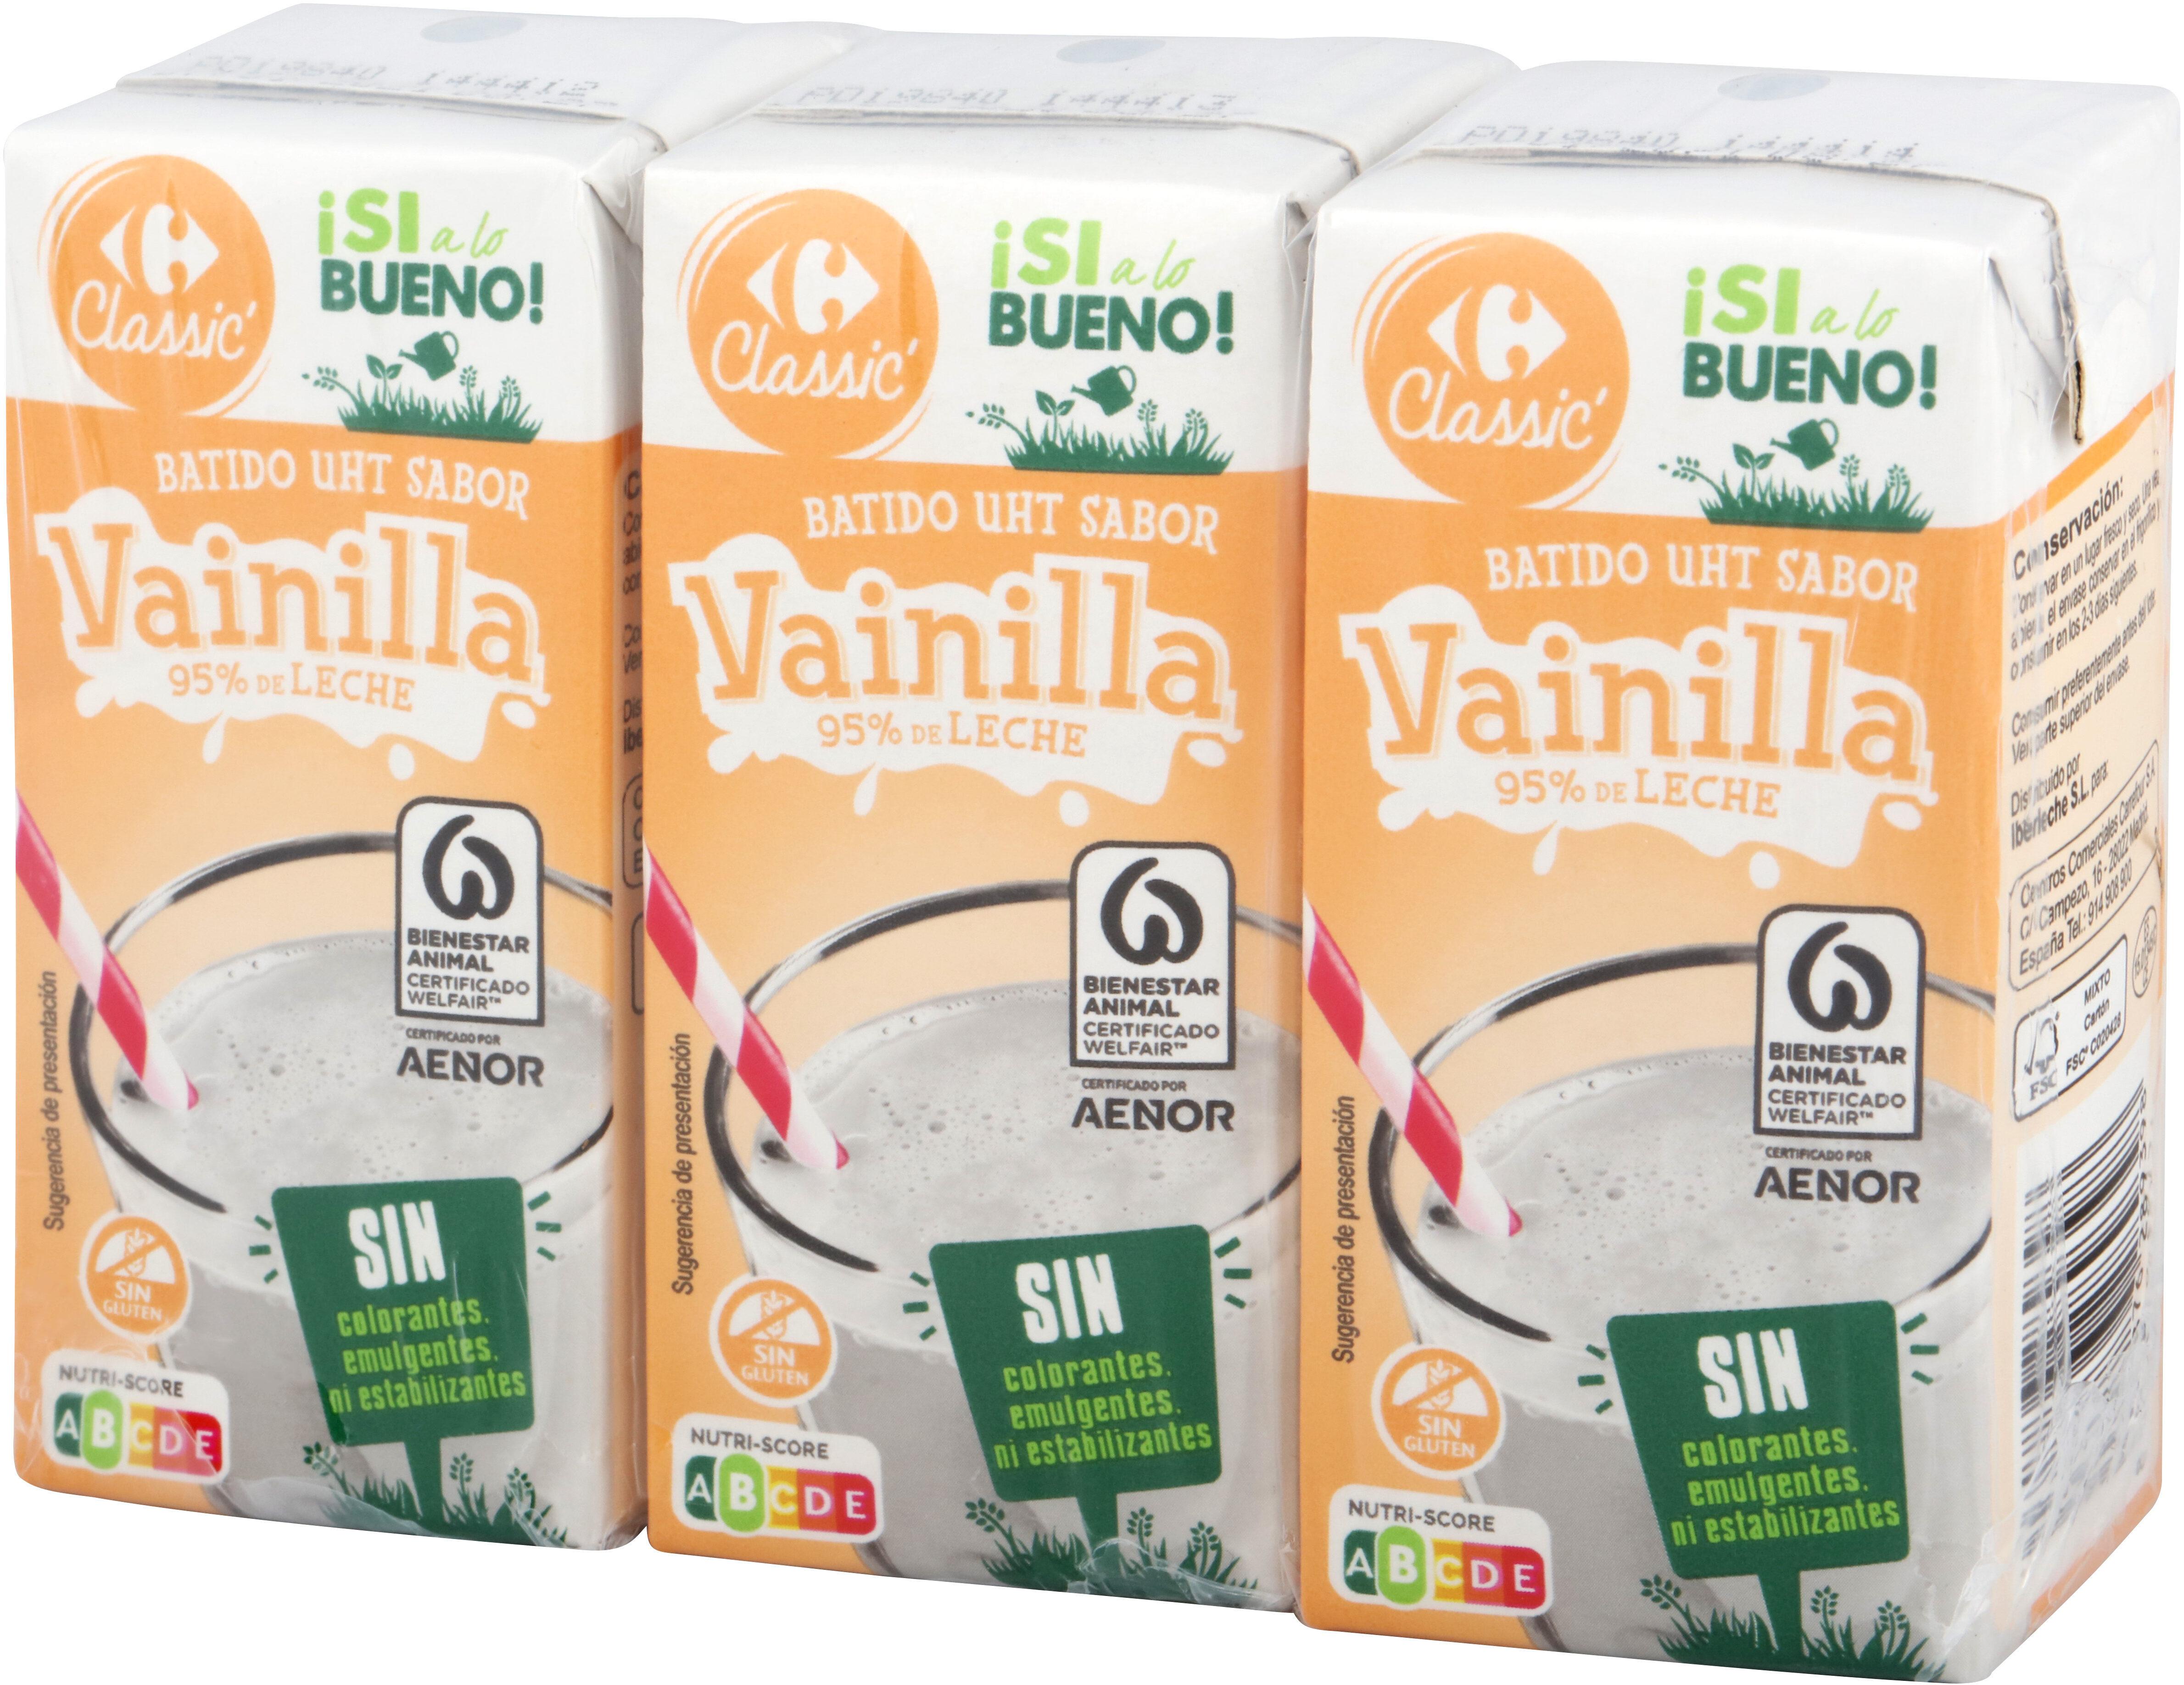 Barido de Vainilla - Produit - es